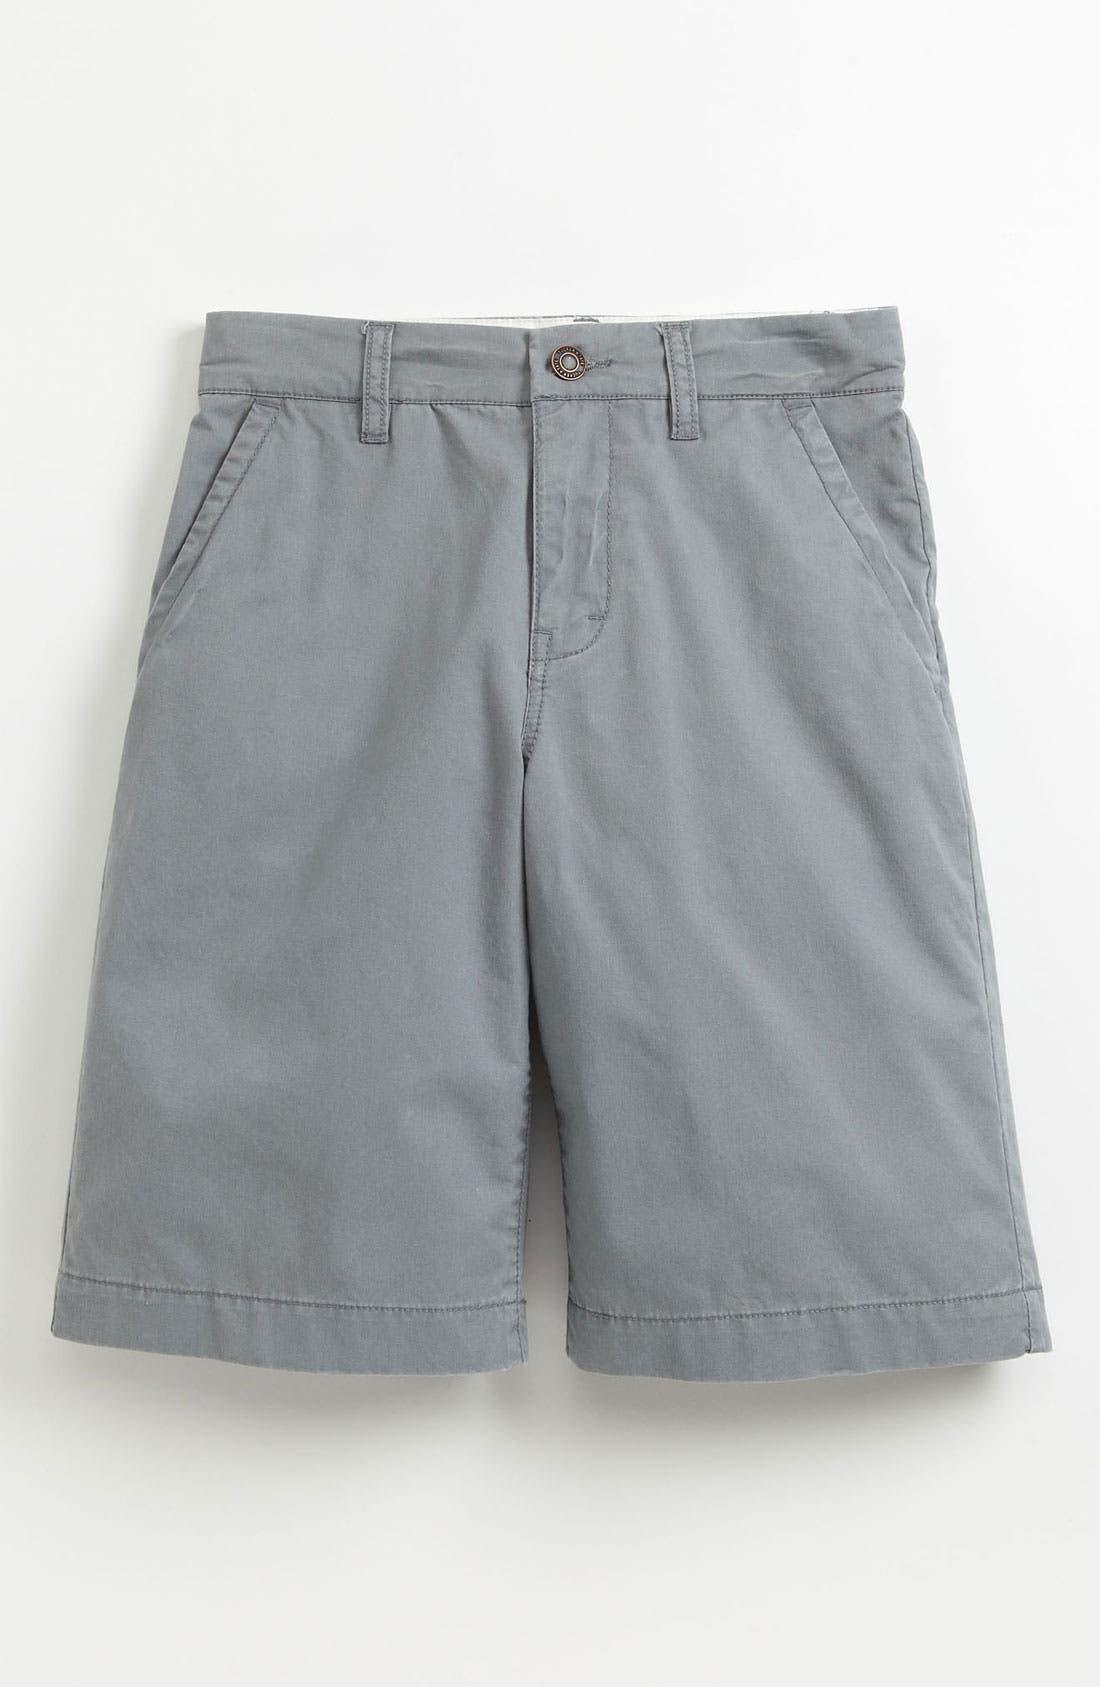 Alternate Image 1 Selected - Tucker + Tate 'Stunt' Chino Shorts (Little Boys)